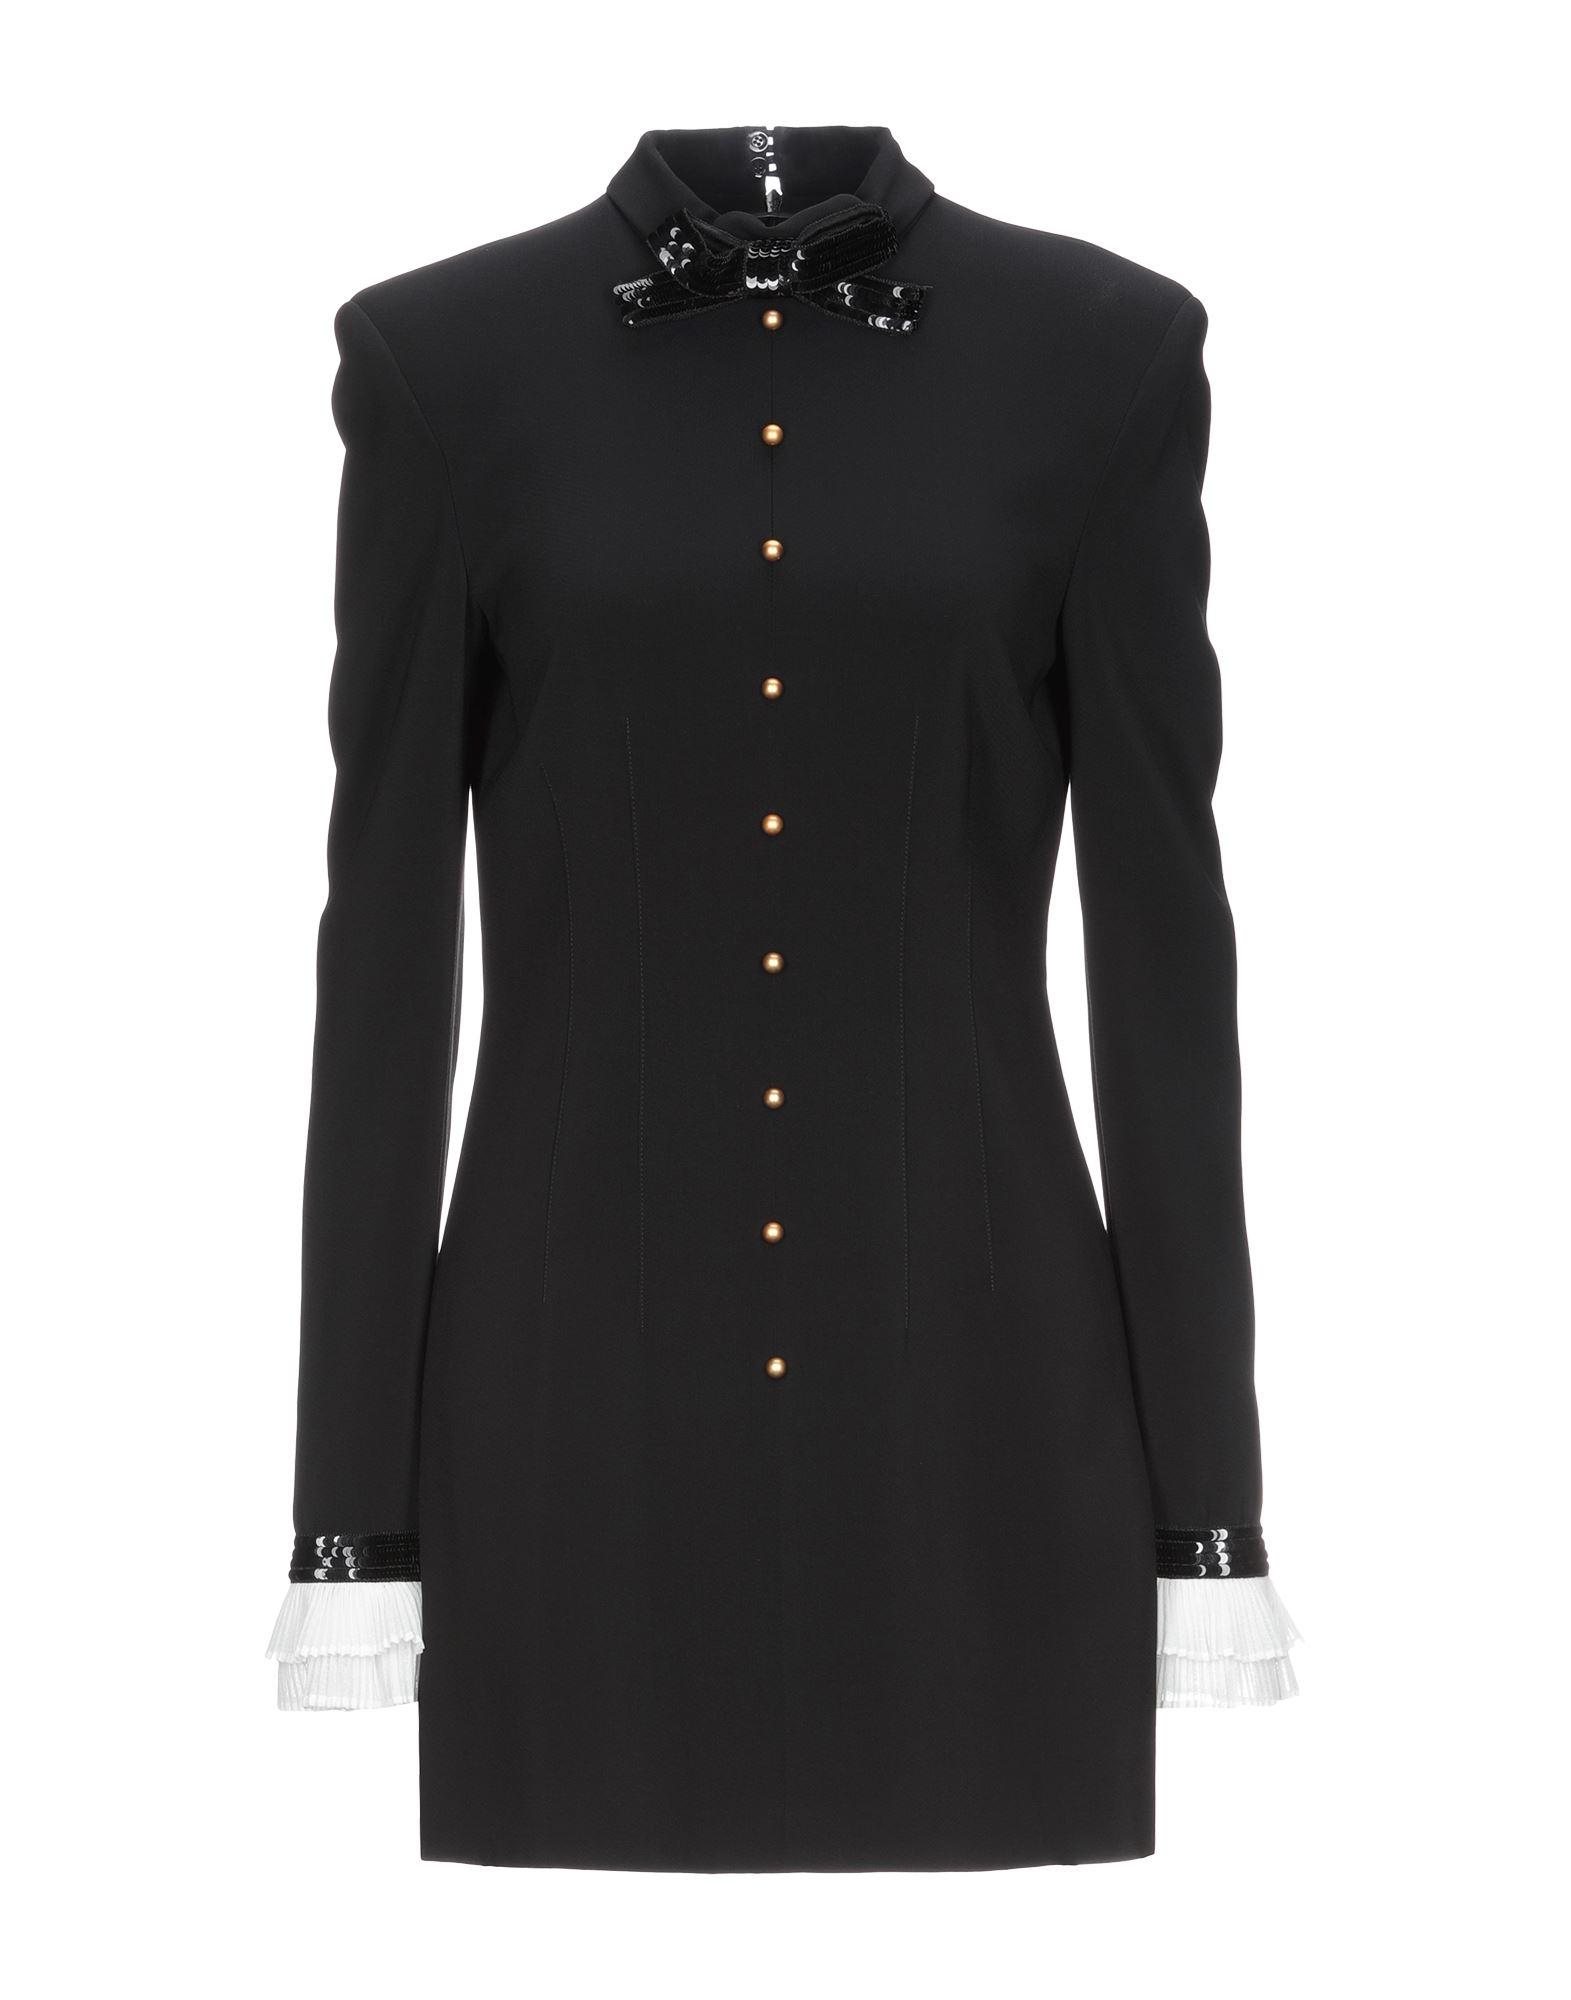 PHILOSOPHY di LORENZO SERAFINI Short dresses. crepe, sequins, solid color, turtleneck, long sleeves, no pockets, rear closure, zipper closure, fully lined, stretch. 96% Viscose, 4% Elastane